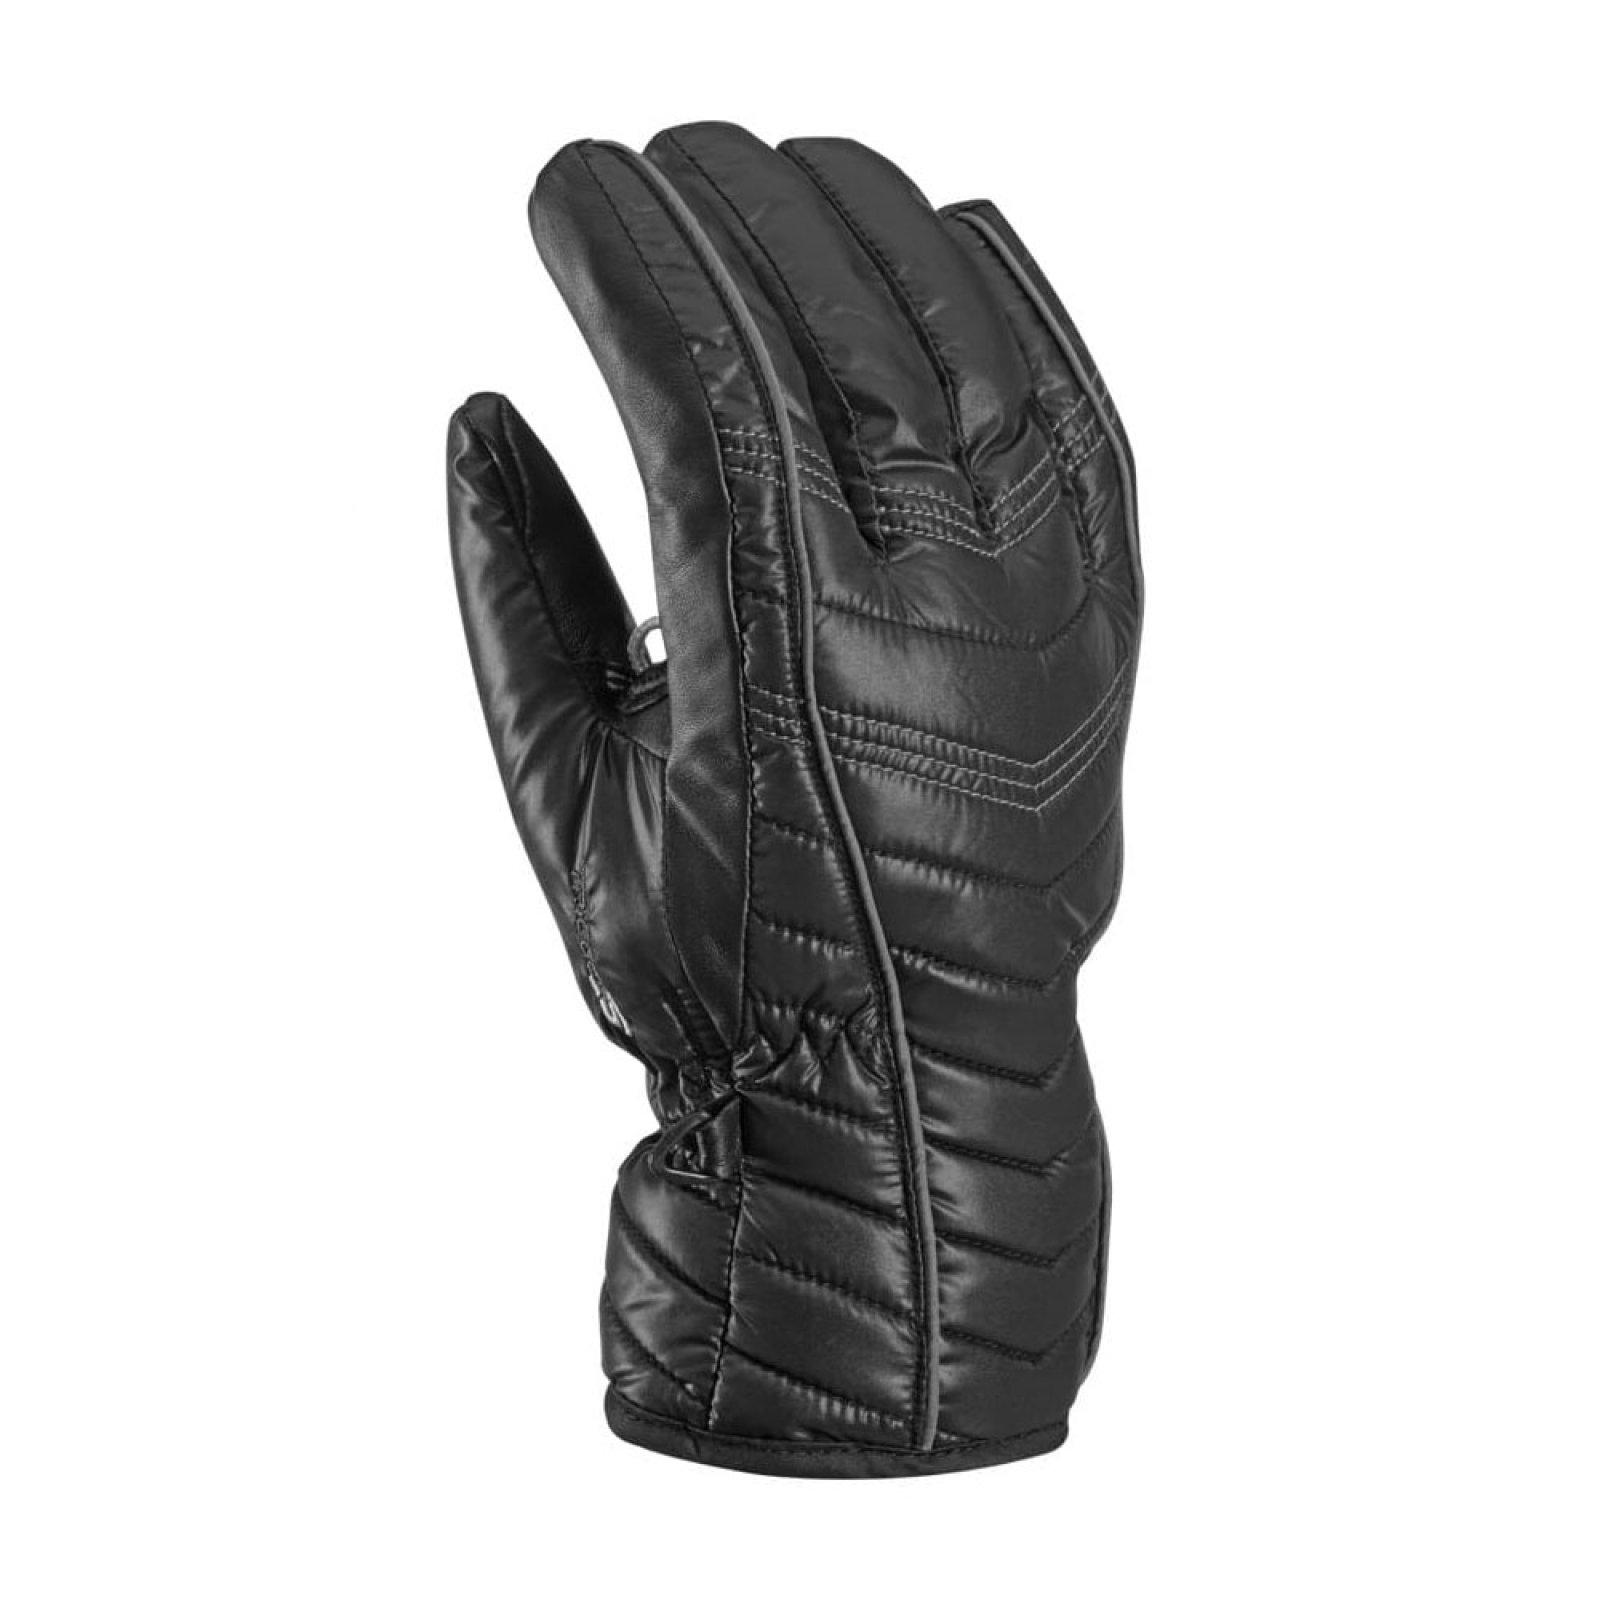 Lyžařské rukavice Leki Cortina S GTX Lady - Actisport.cz c142281948